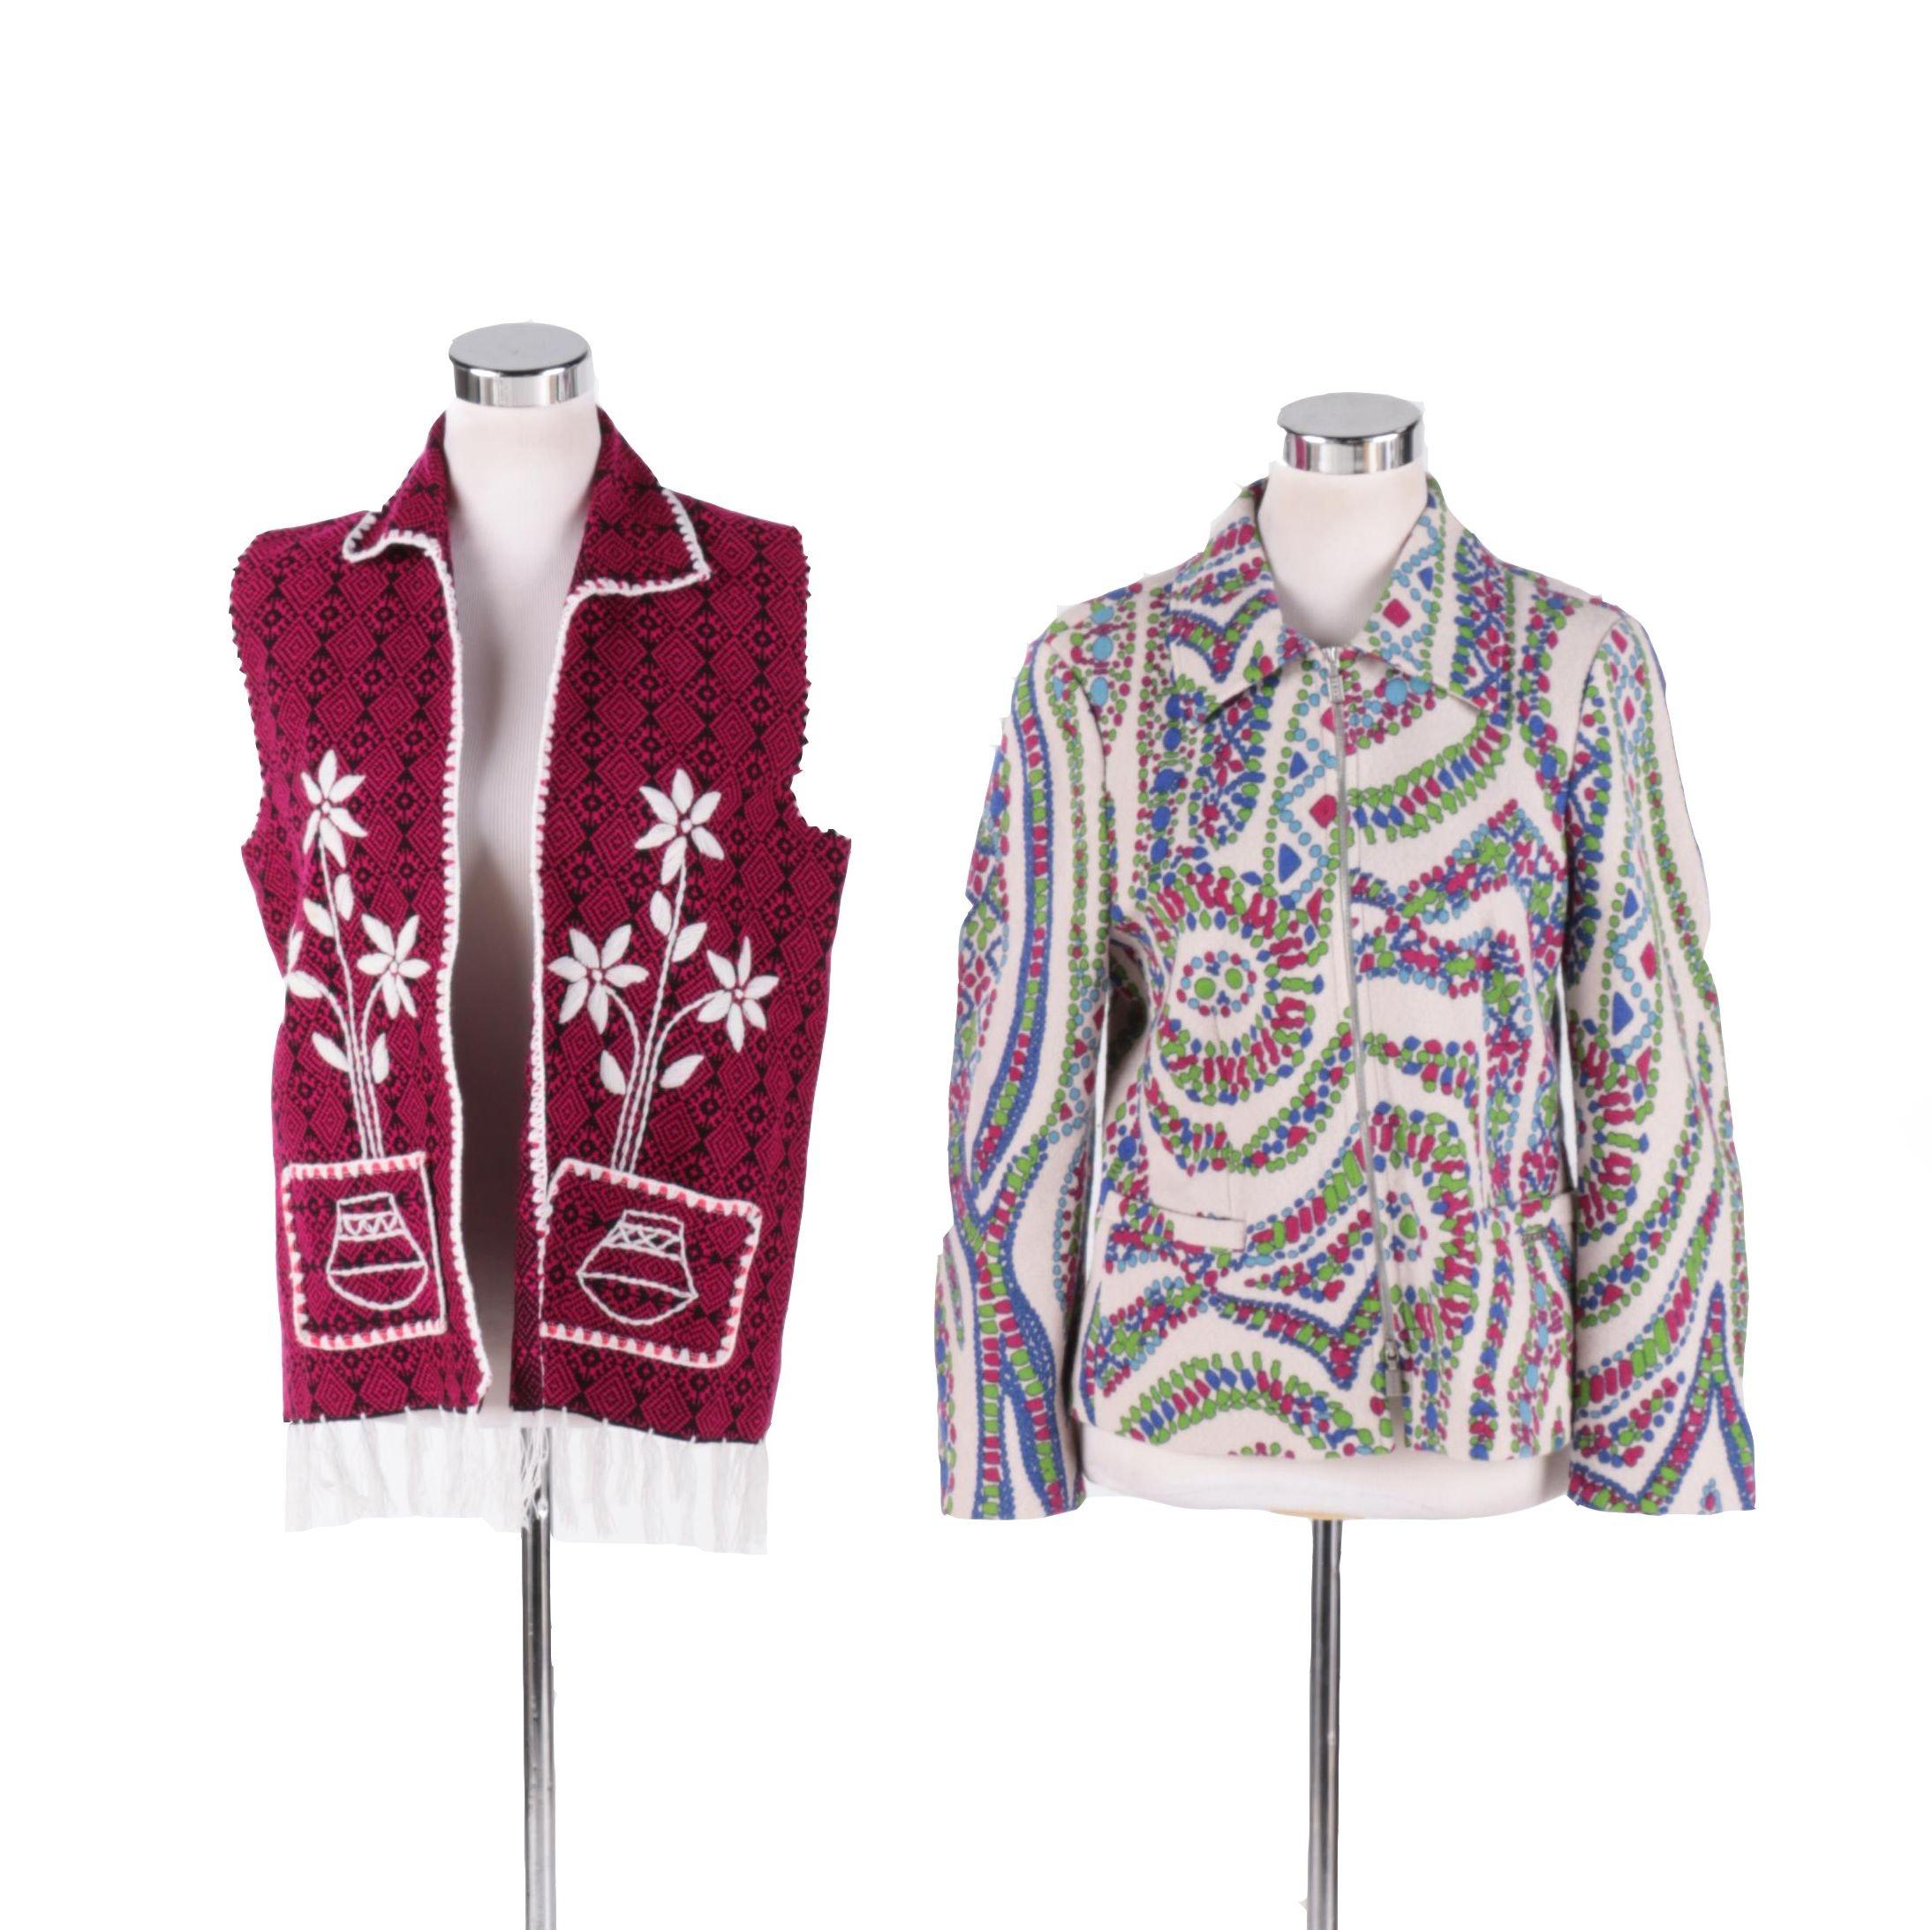 Vintage Vest and Jacket Circa 1970